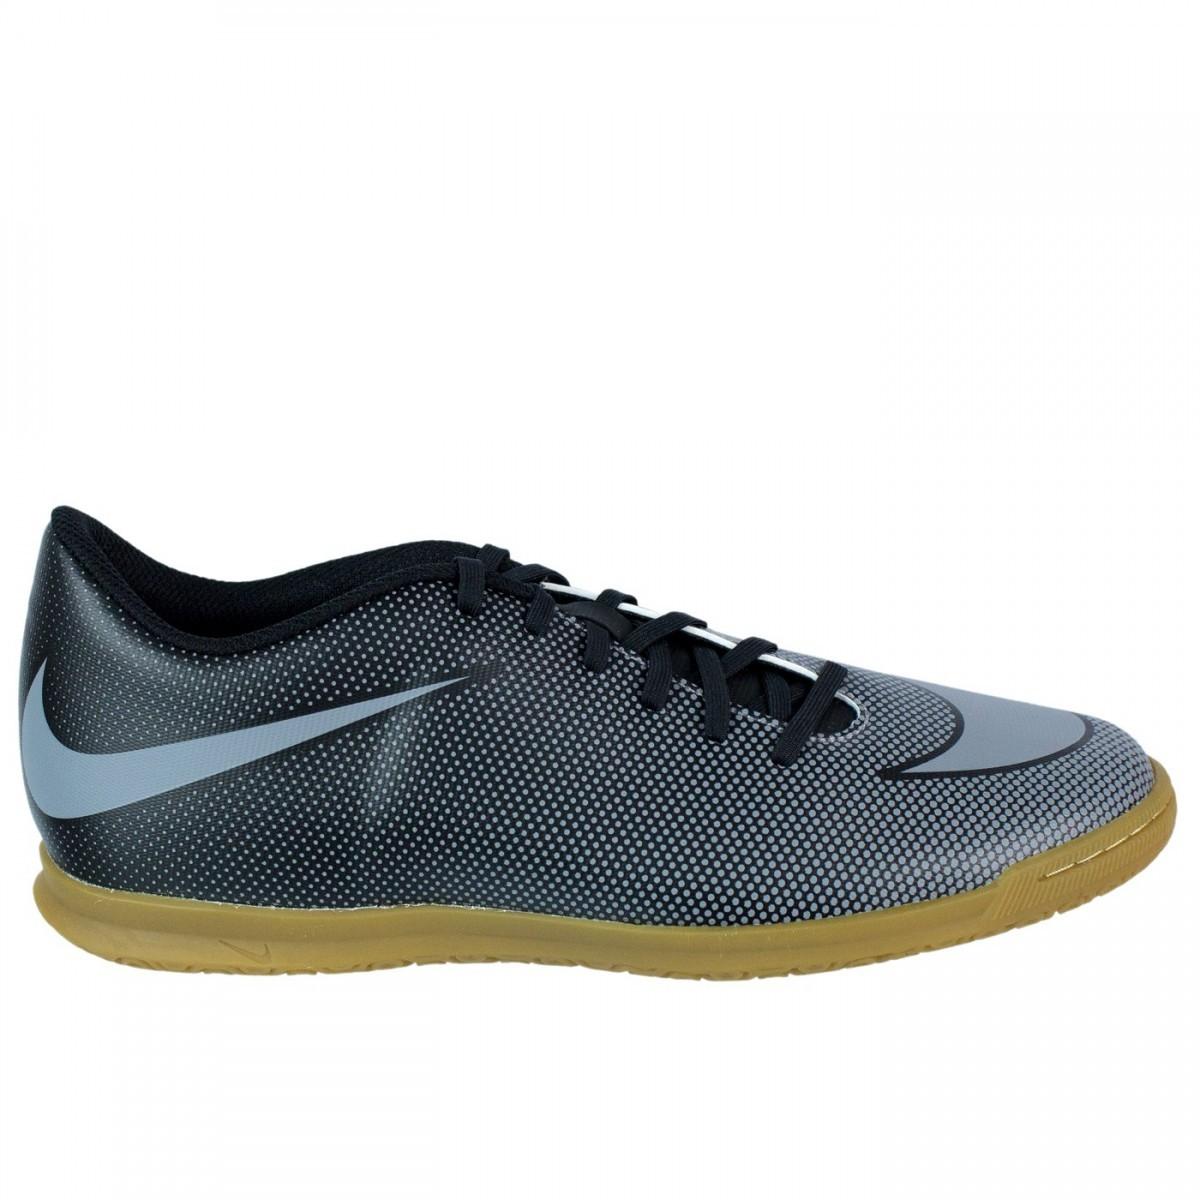 ... Bizz Store - Chuteira Infantil Futsal Nike Bravata II IC JR  17b9cd6b1bcf7e ... 349ece5974d43